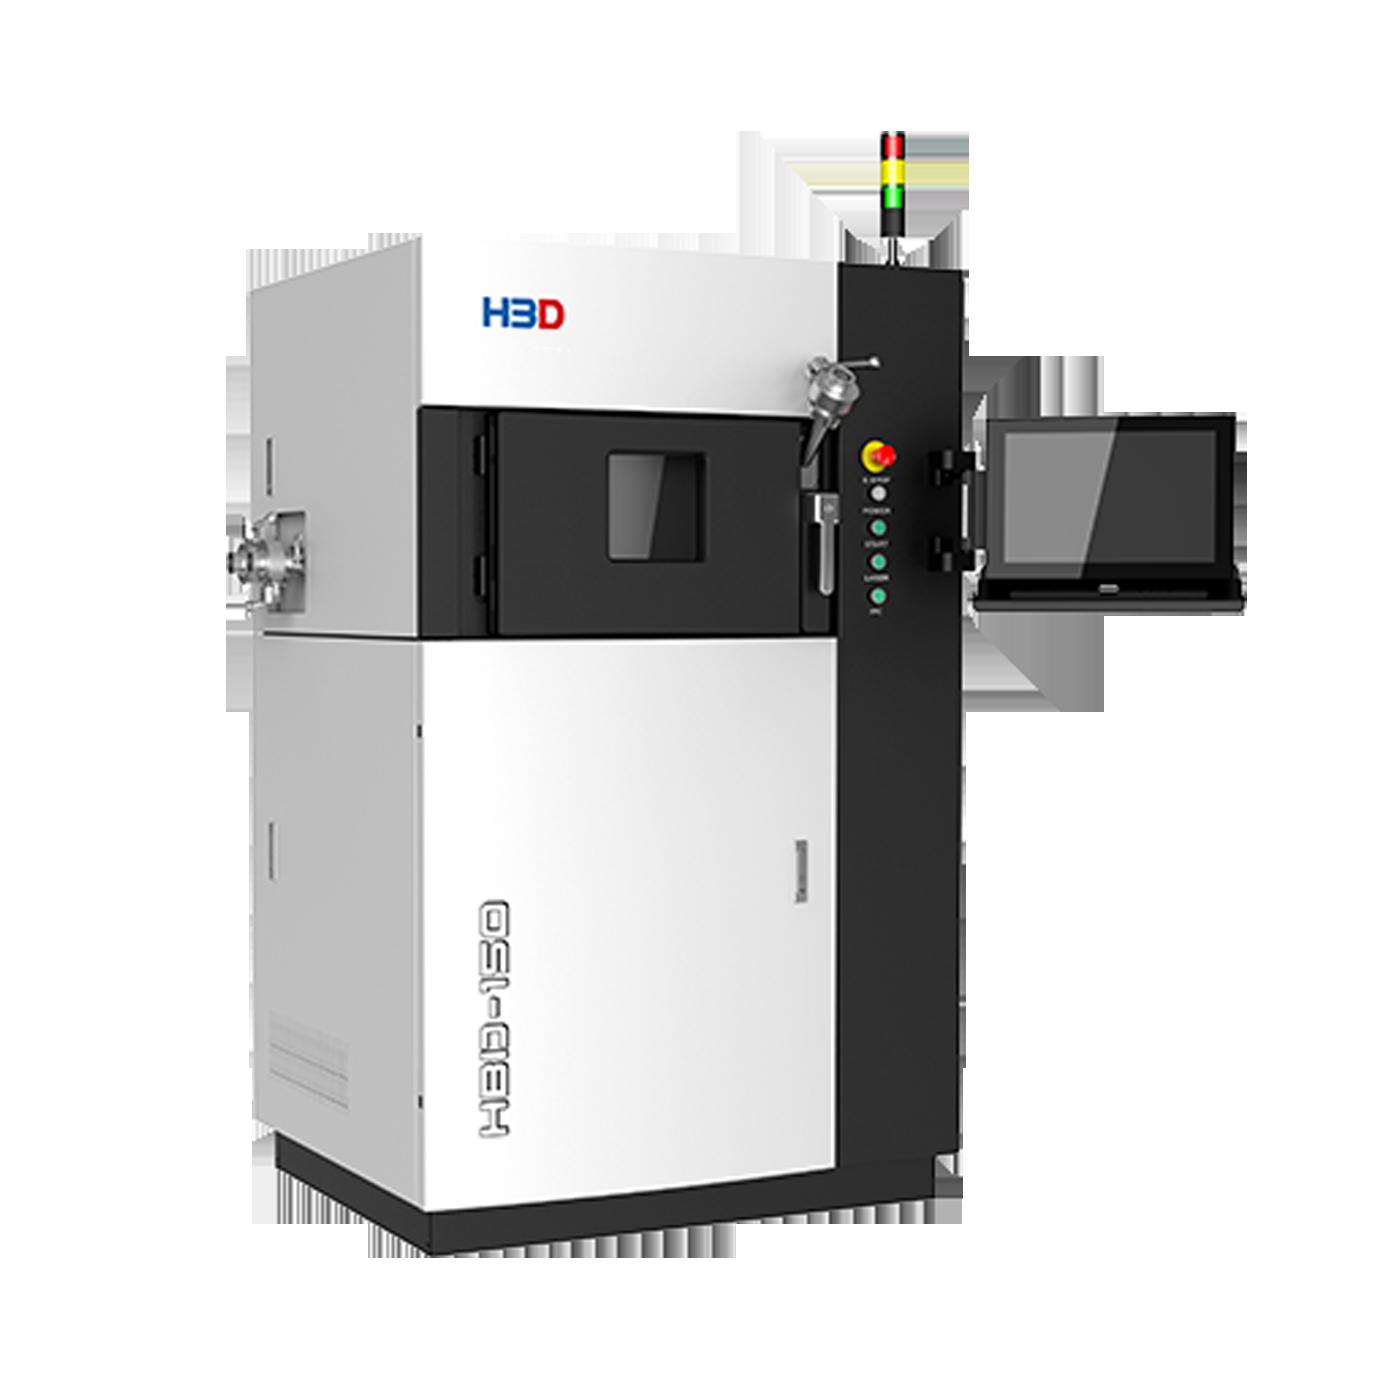 HBD-150 SLM 3D PRINTER